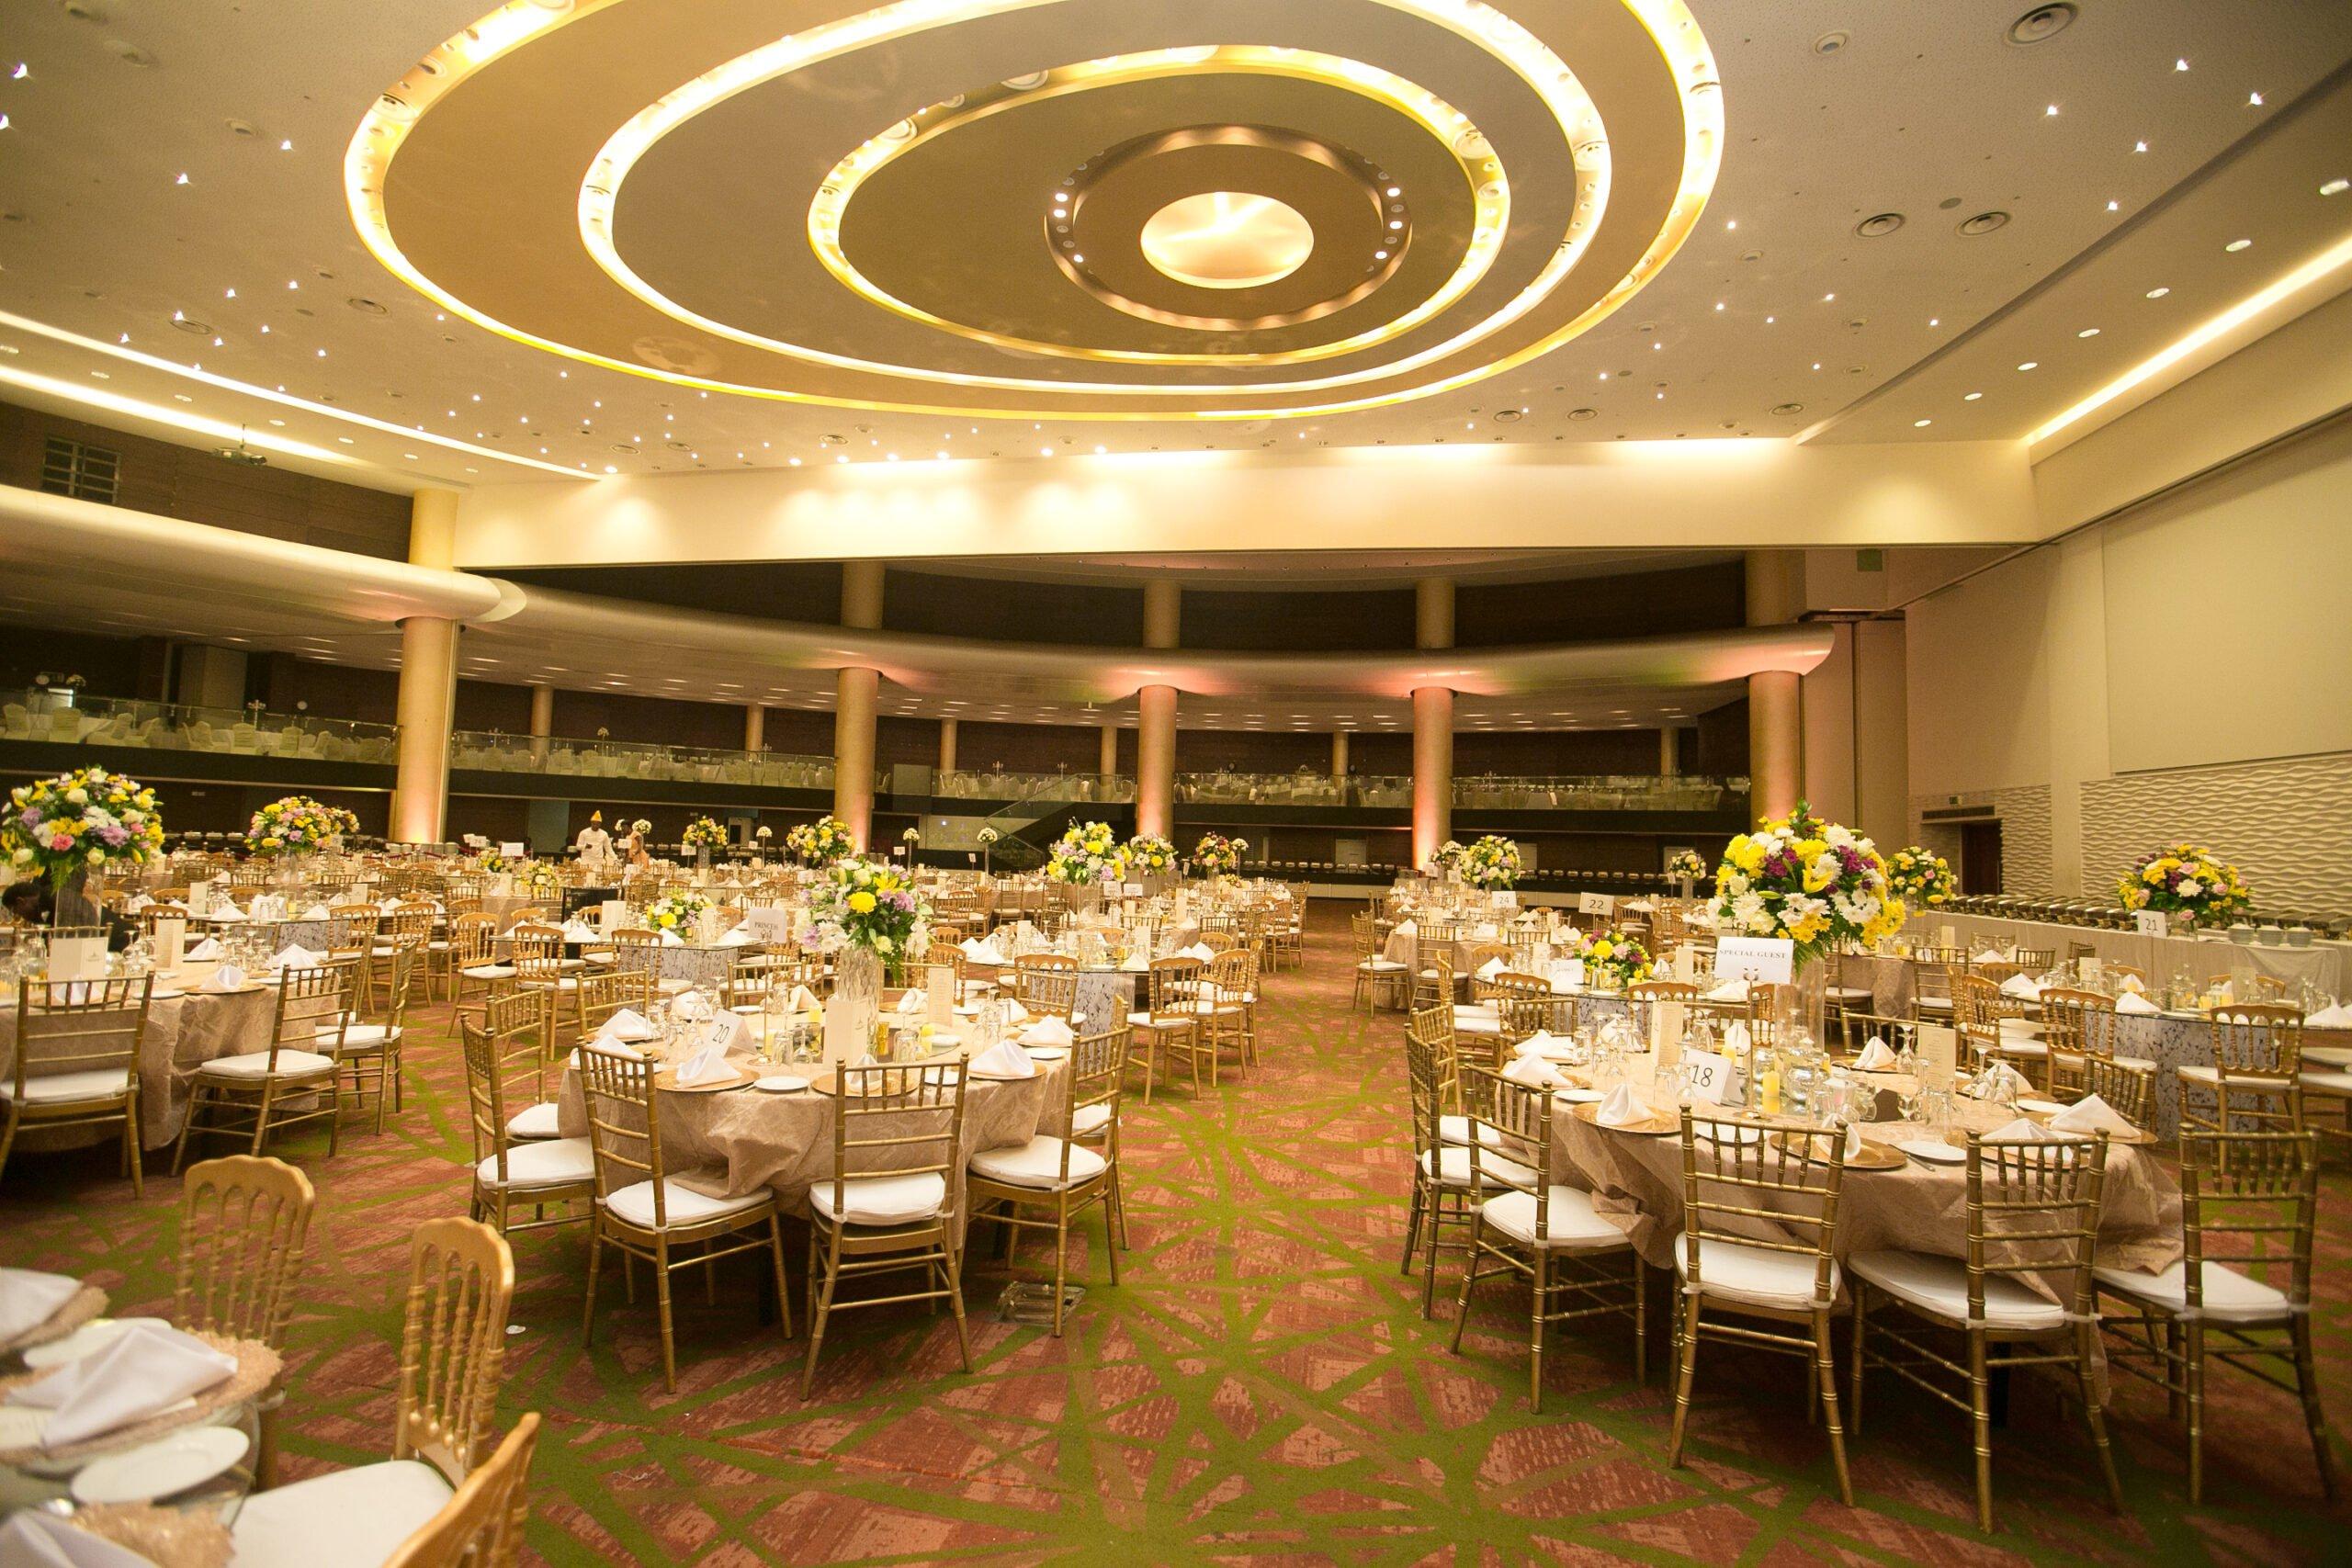 Eko Hotels & Suites on list and address of wedding venues in lagos nigeria